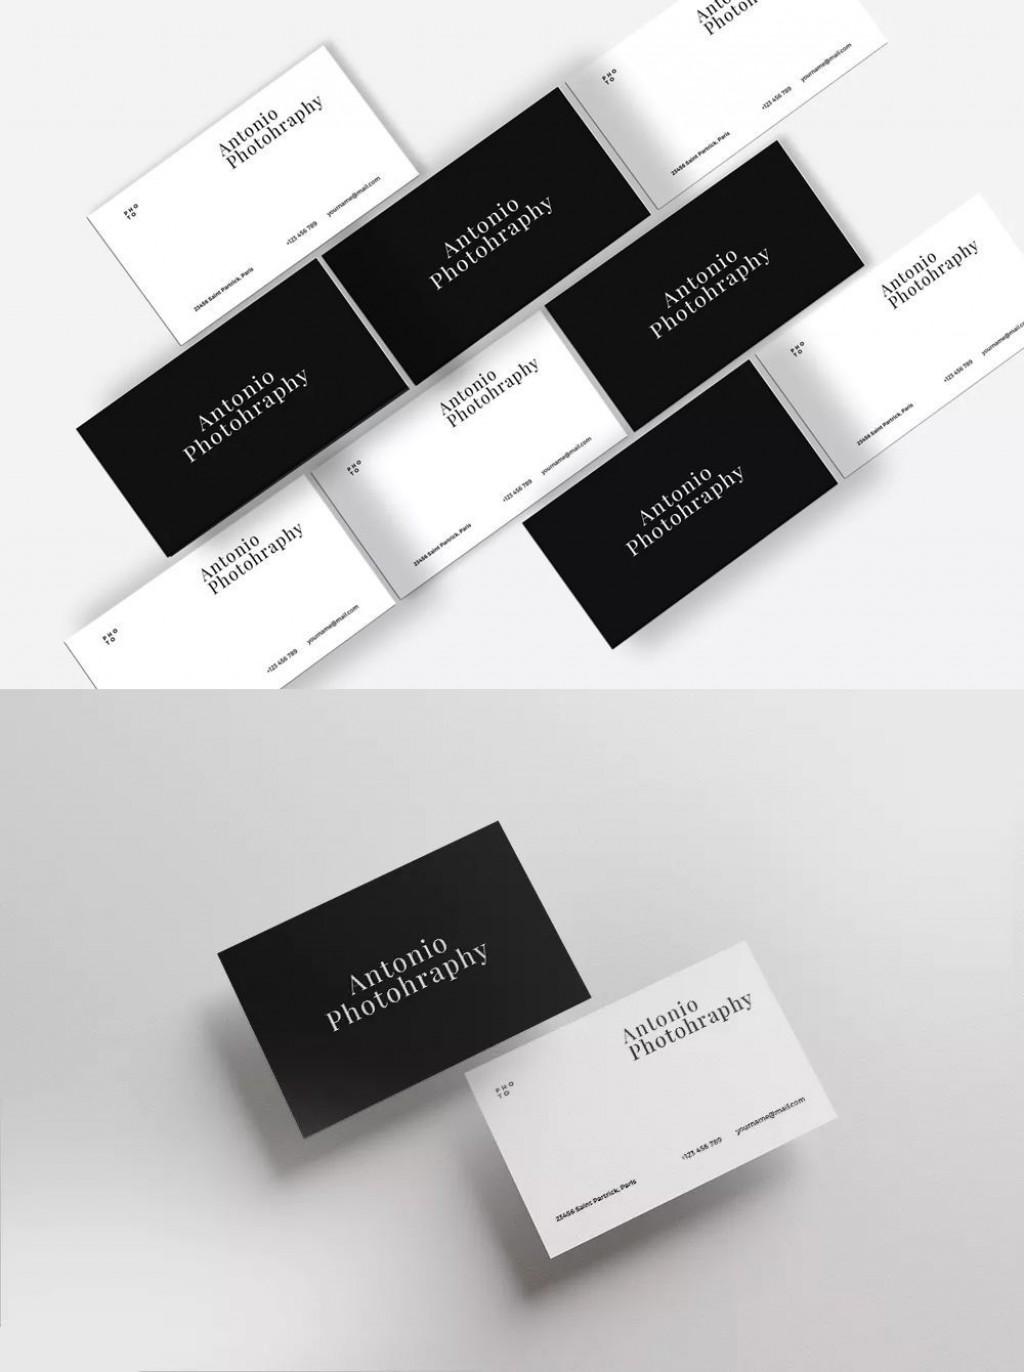 001 Striking Minimalist Busines Card Template Psd High Resolution Large